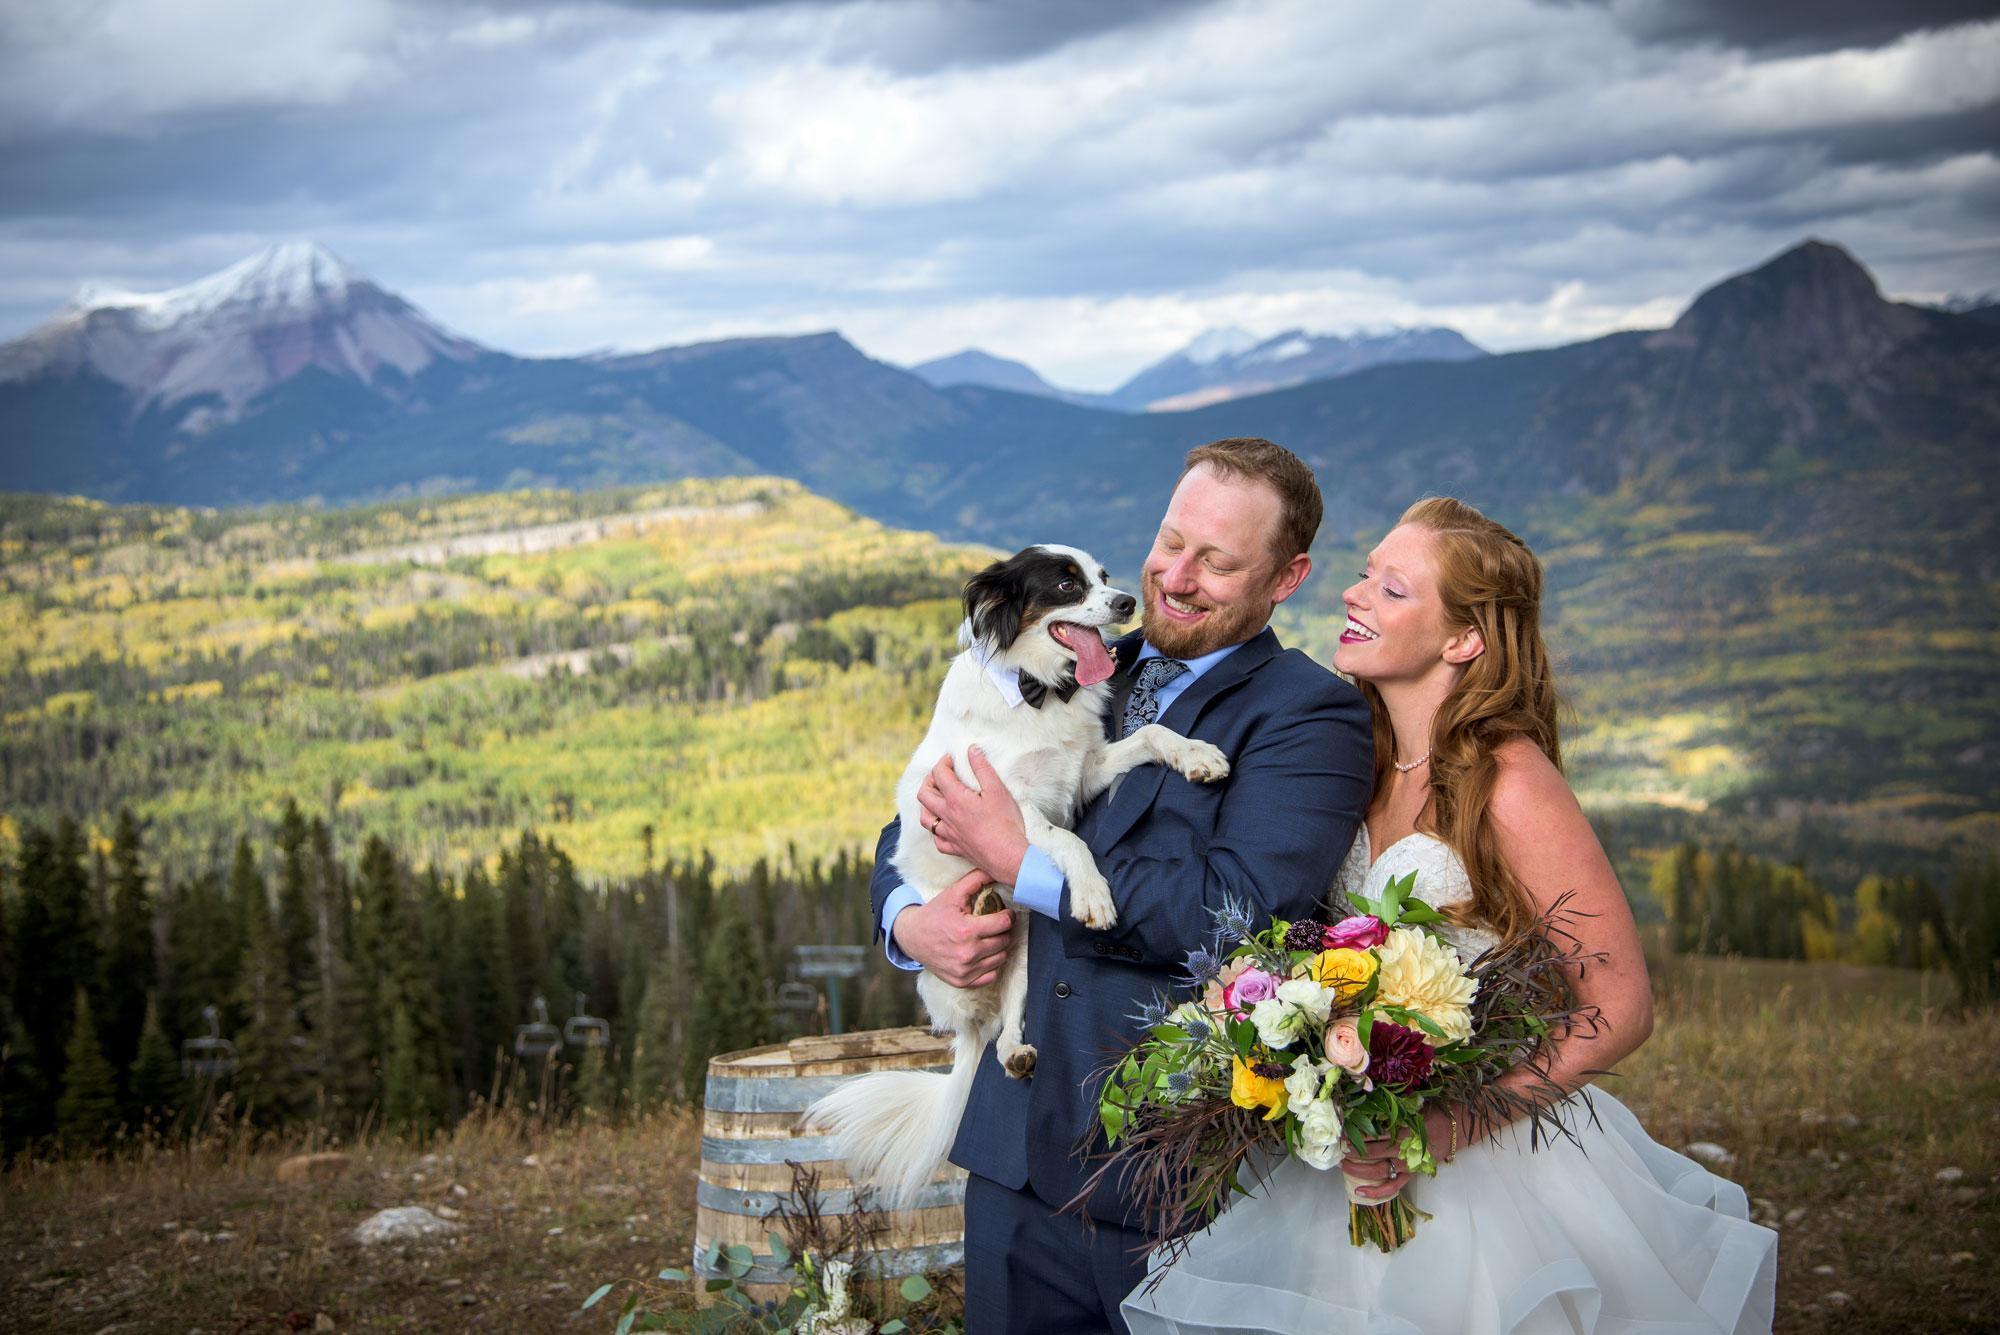 Bride, groom and dog at Purgatory Resort, Durango, Colorado